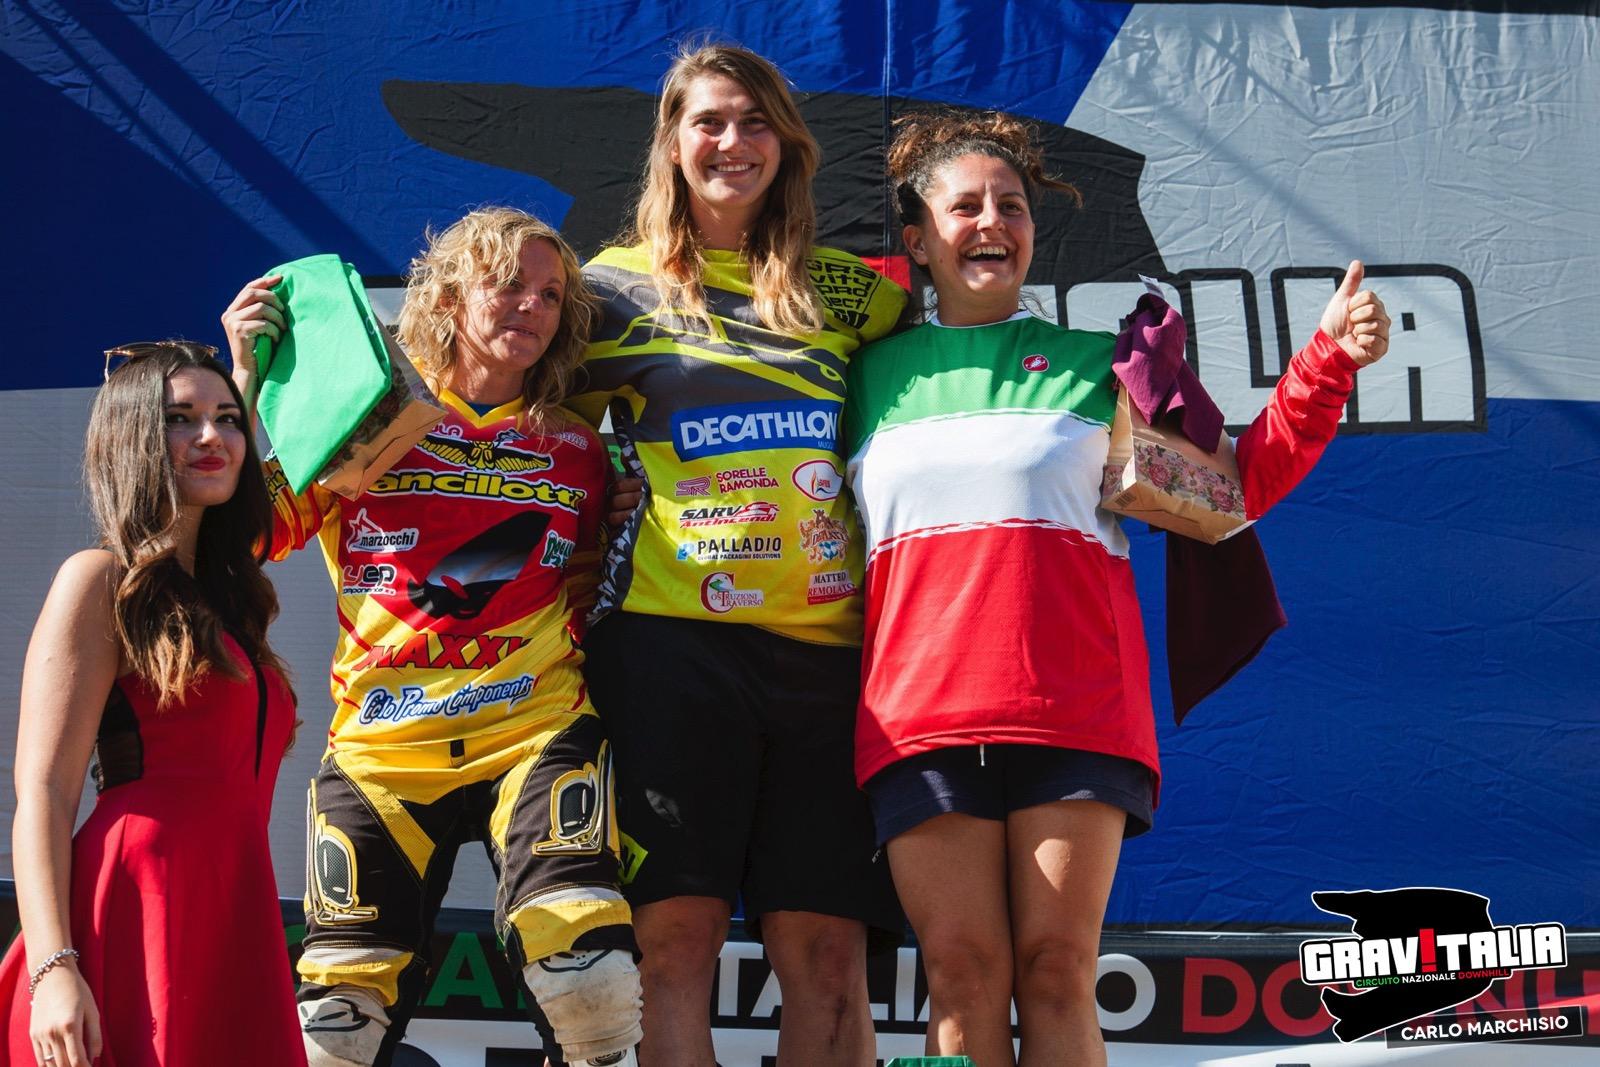 PhotoCarloMarchisio_GIT2015_CampionatiItaliani_Sestola_069